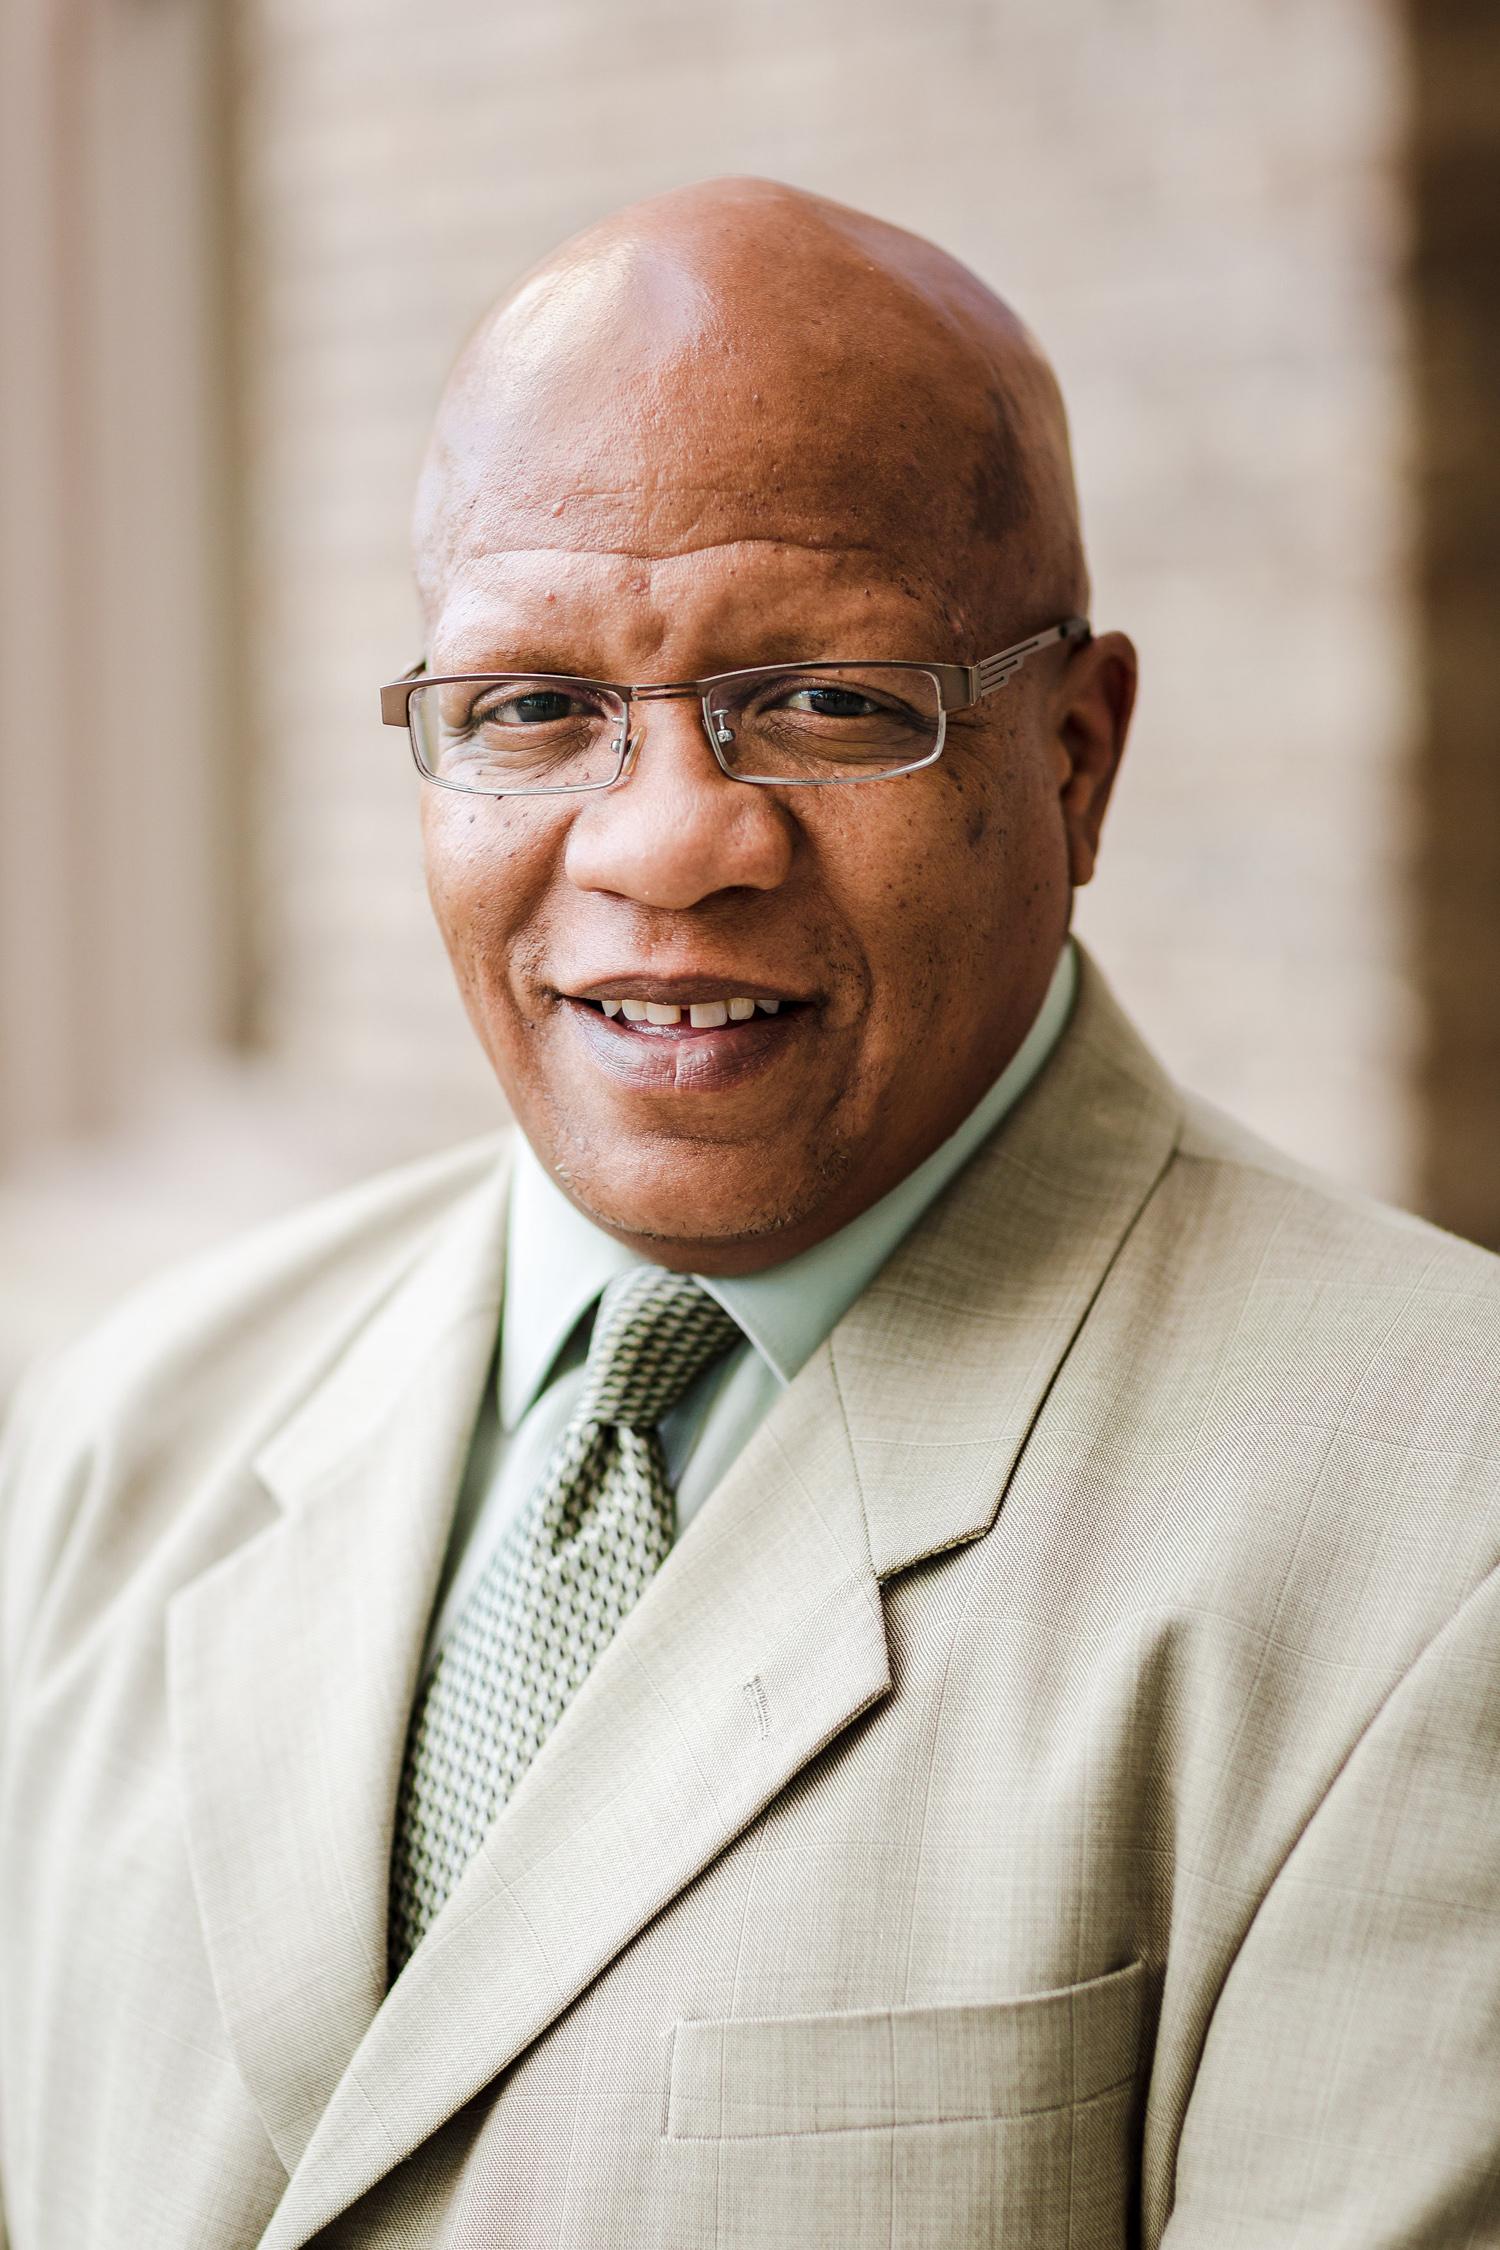 Michael Norris